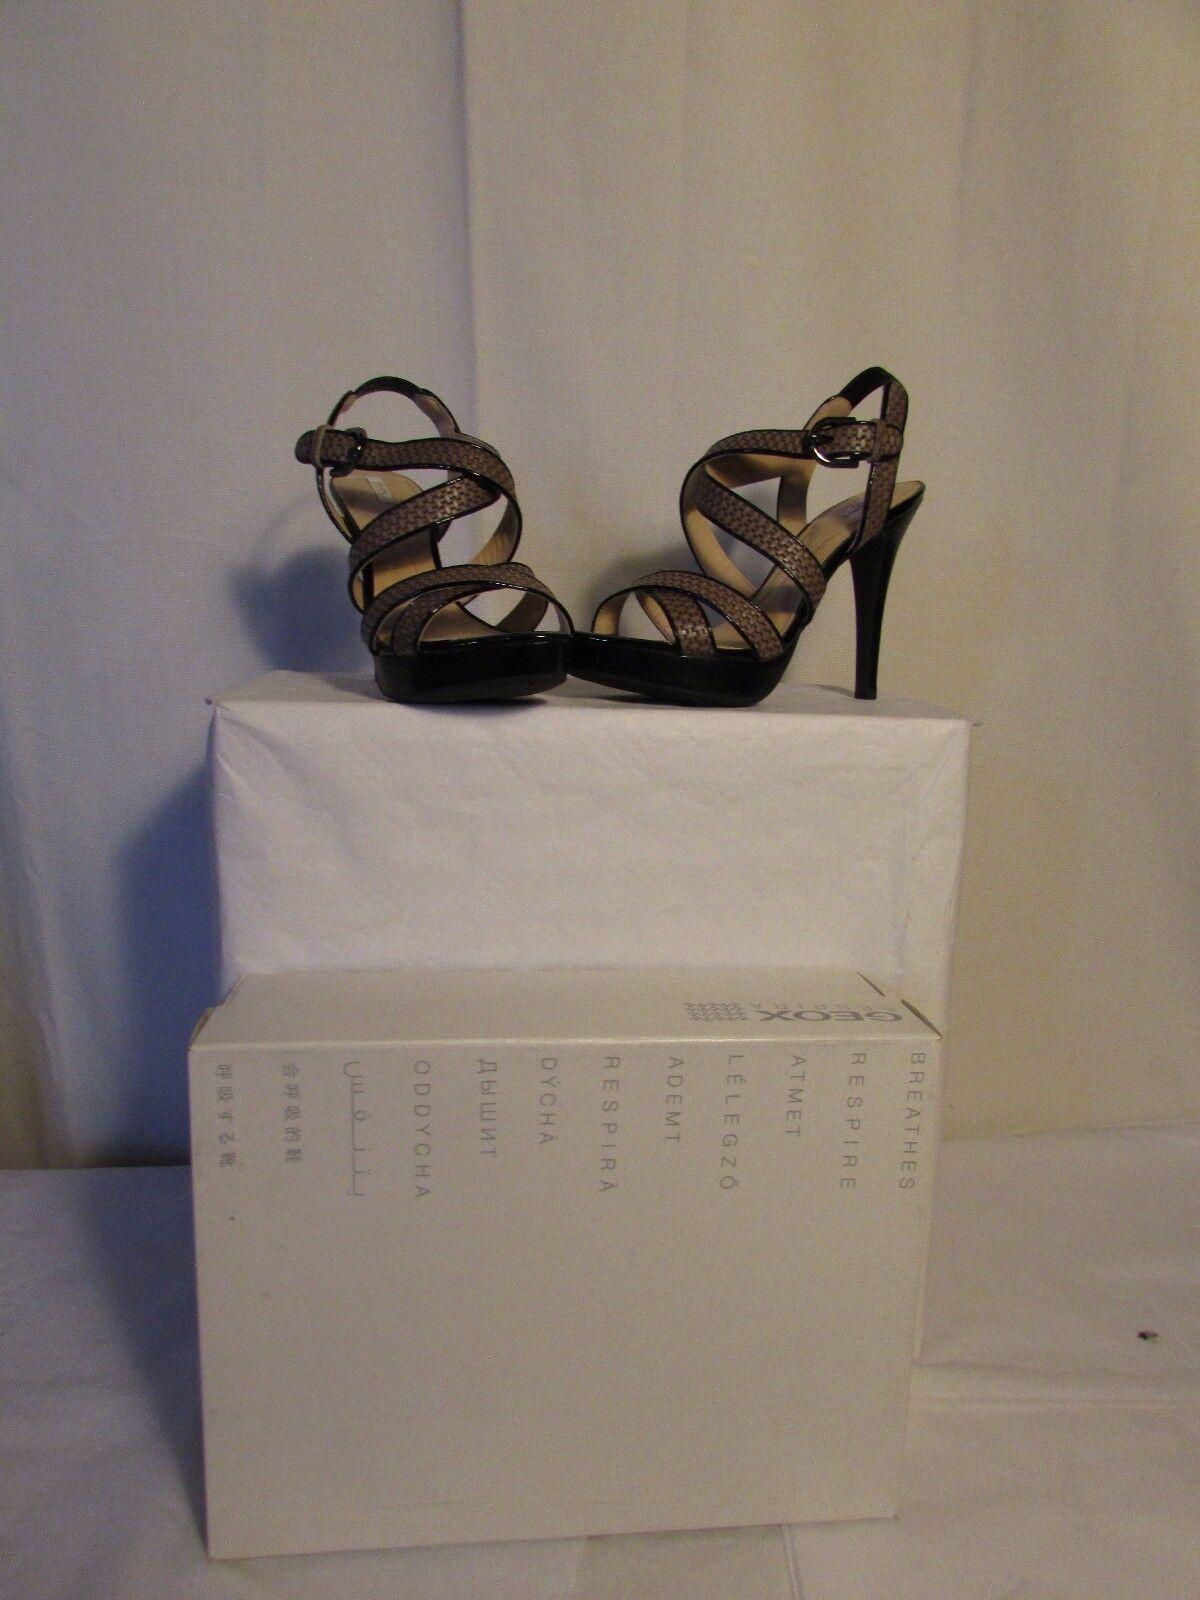 SANDALES habillées GEOX cuir taupe imitation tissage et cuir black 38